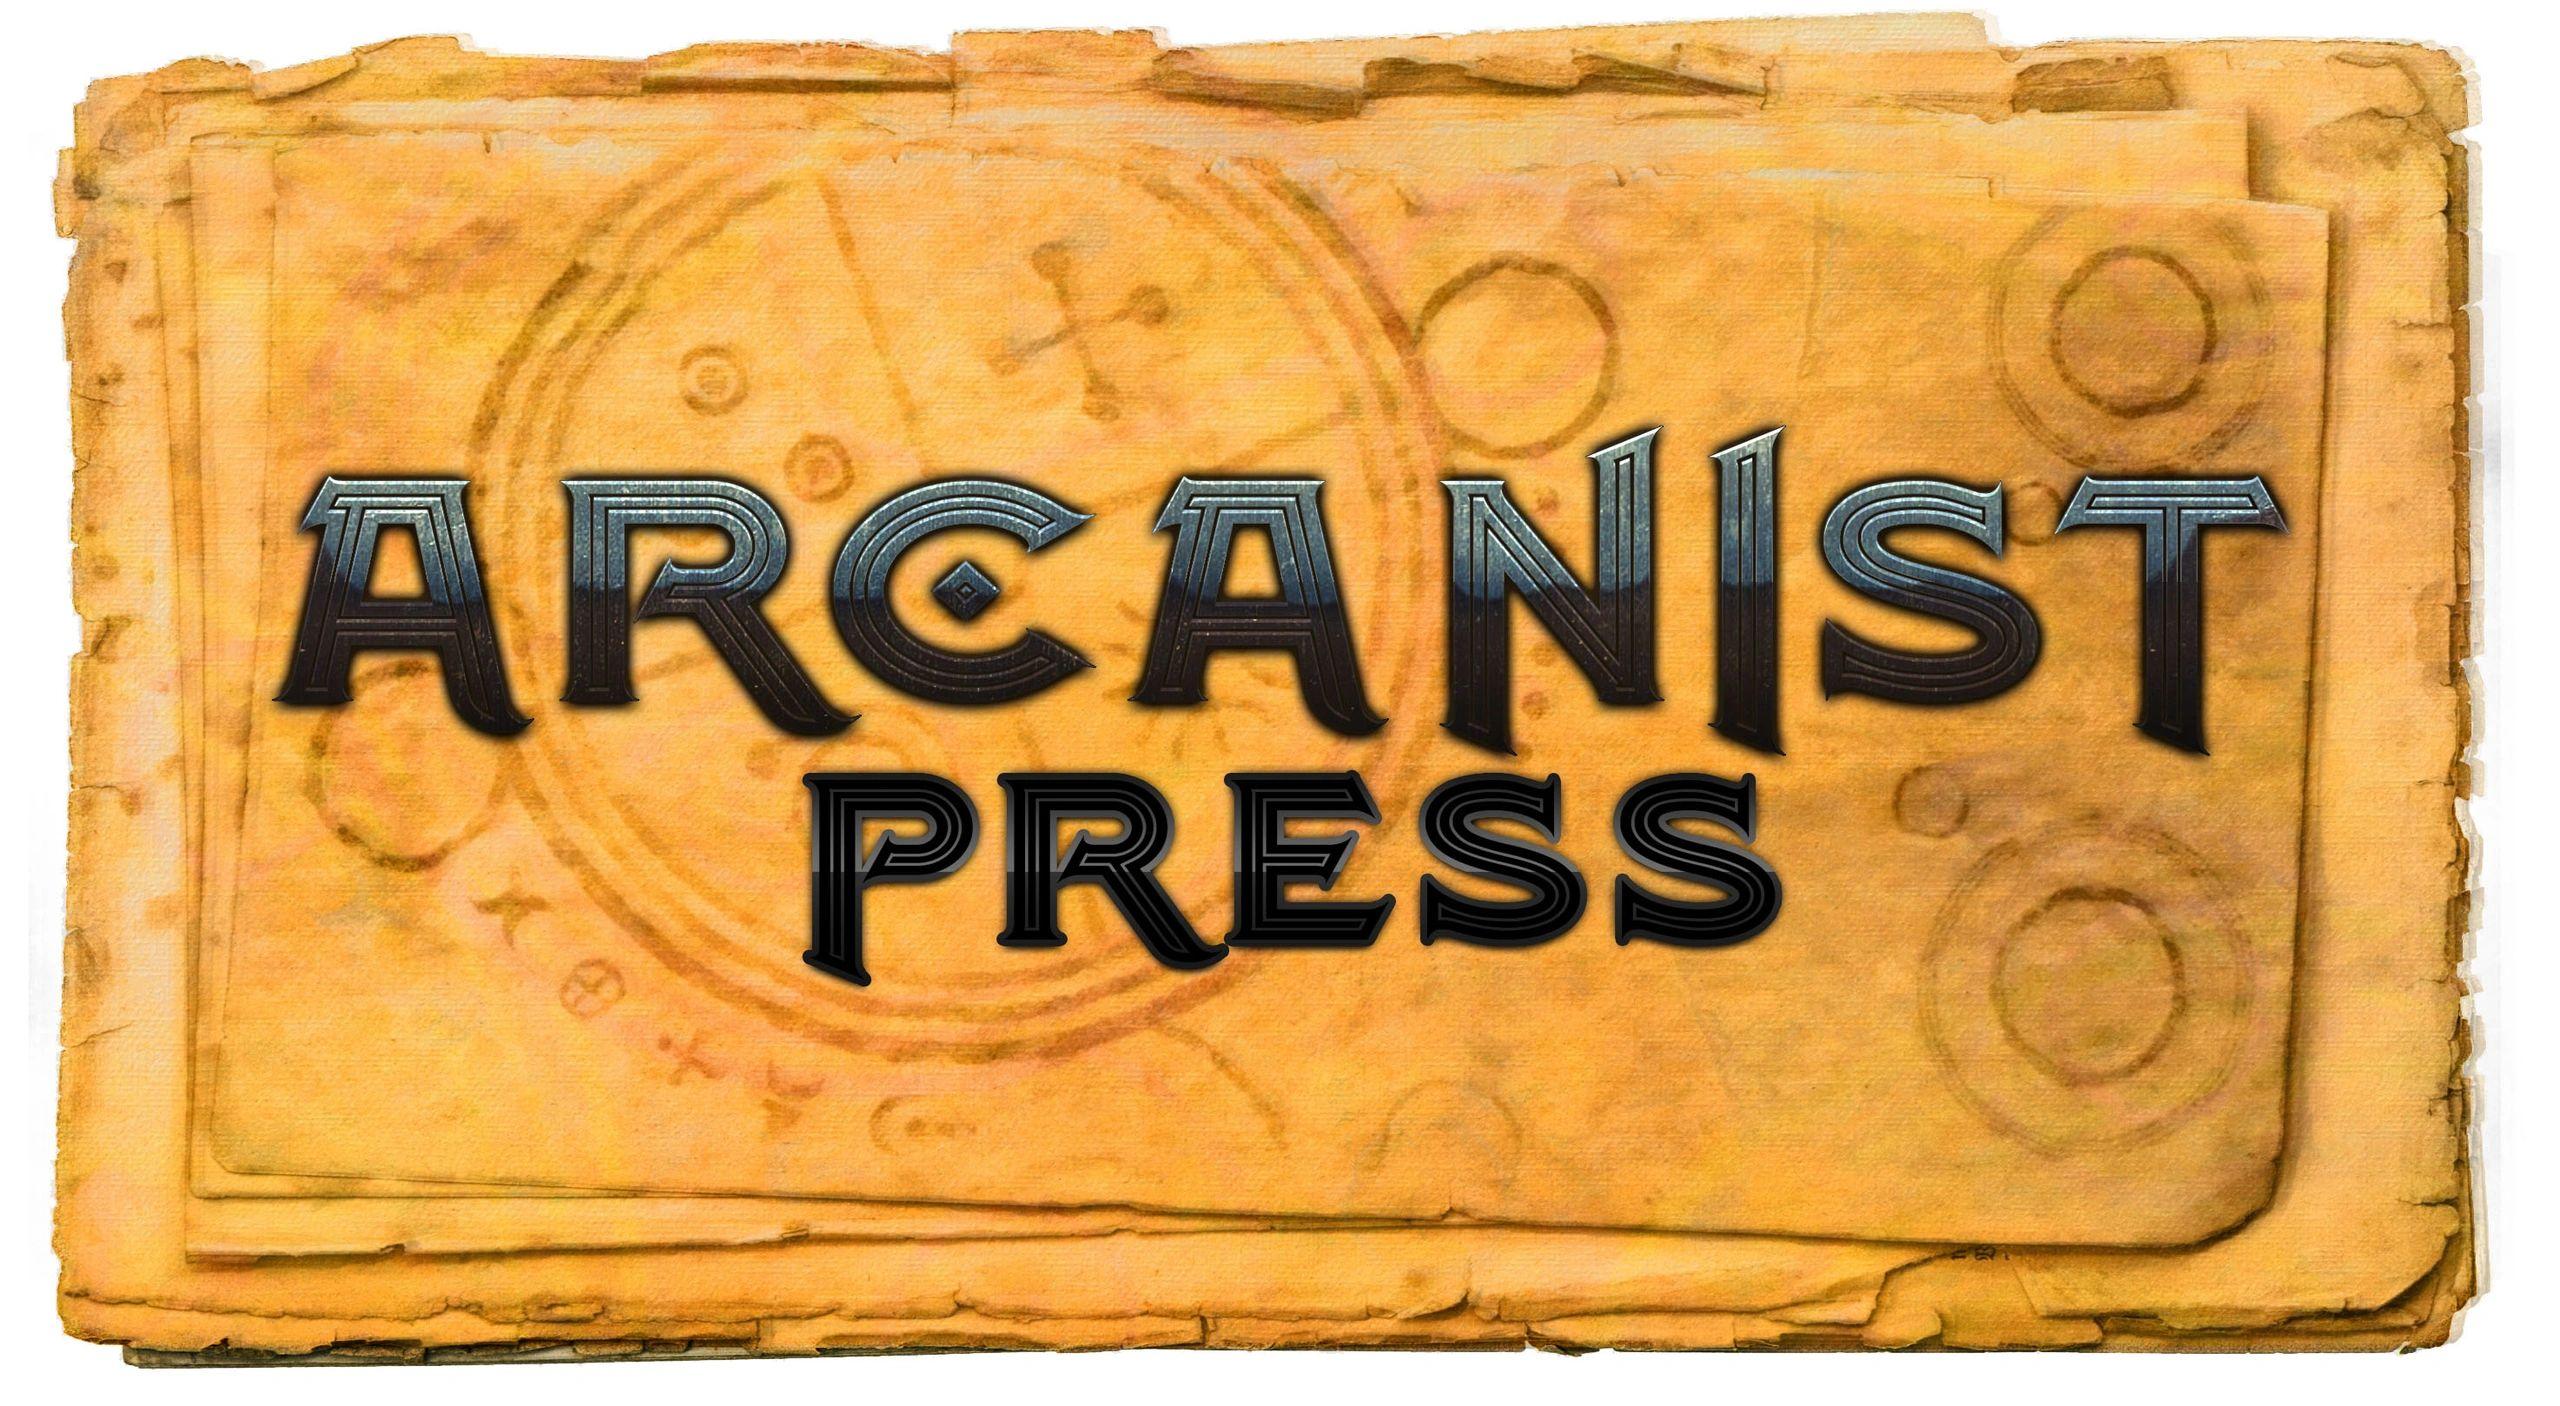 Arcanist Press logo